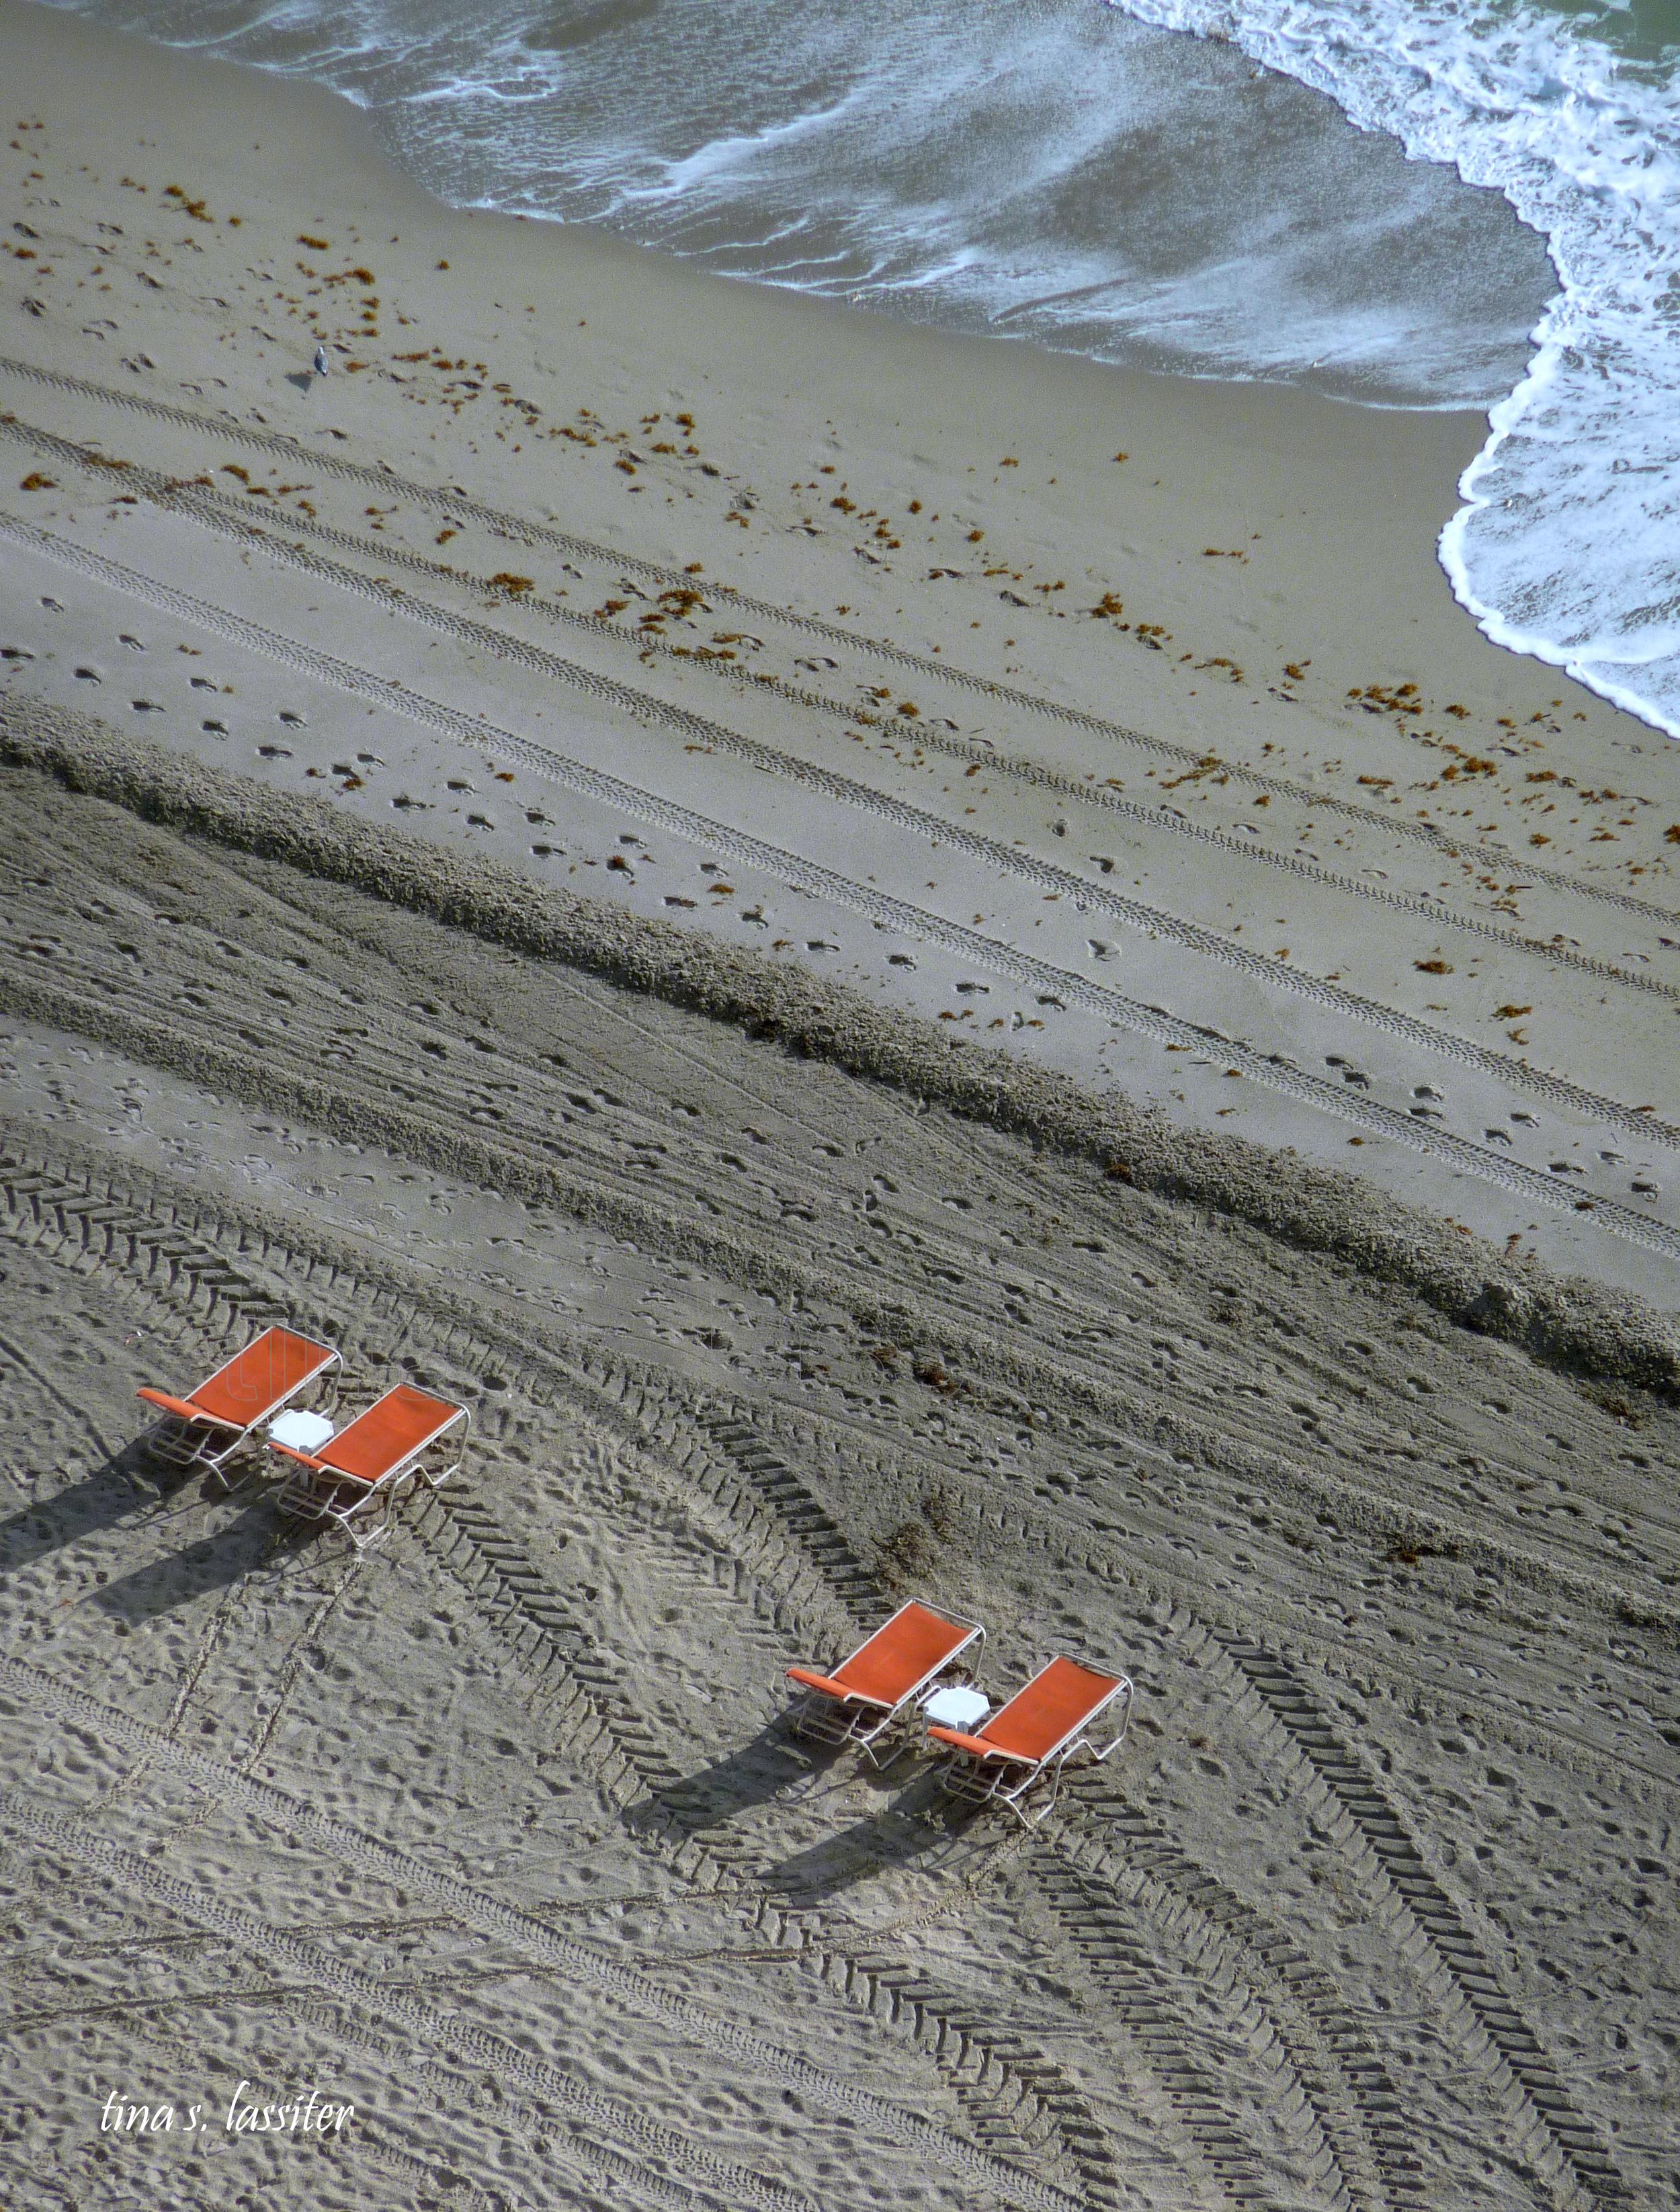 orange chairs on the beach